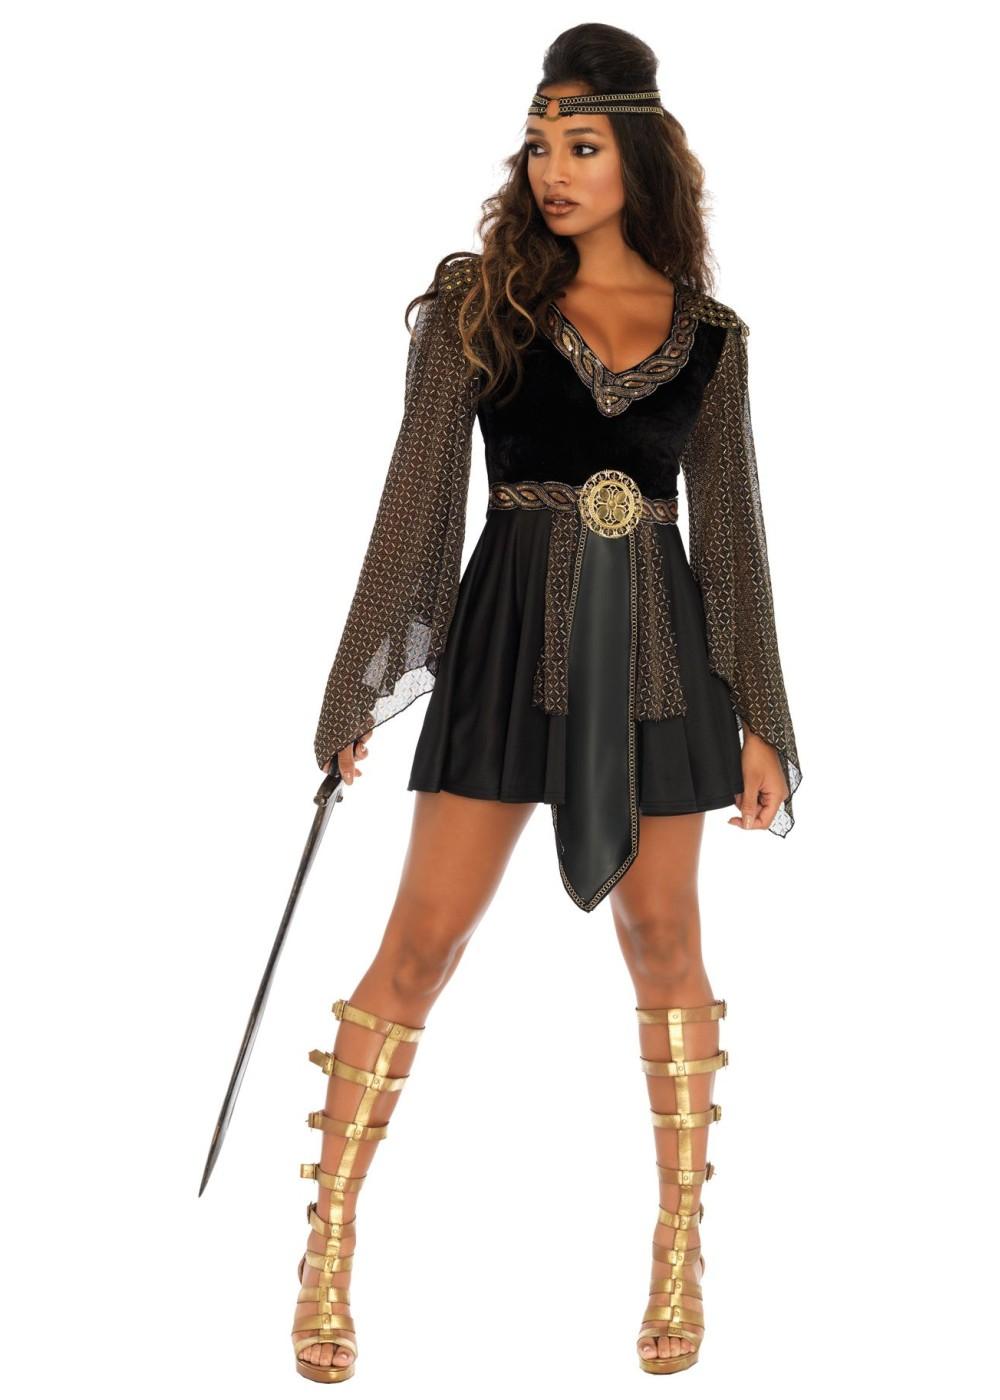 women warrior costume greek costumes new for 2017